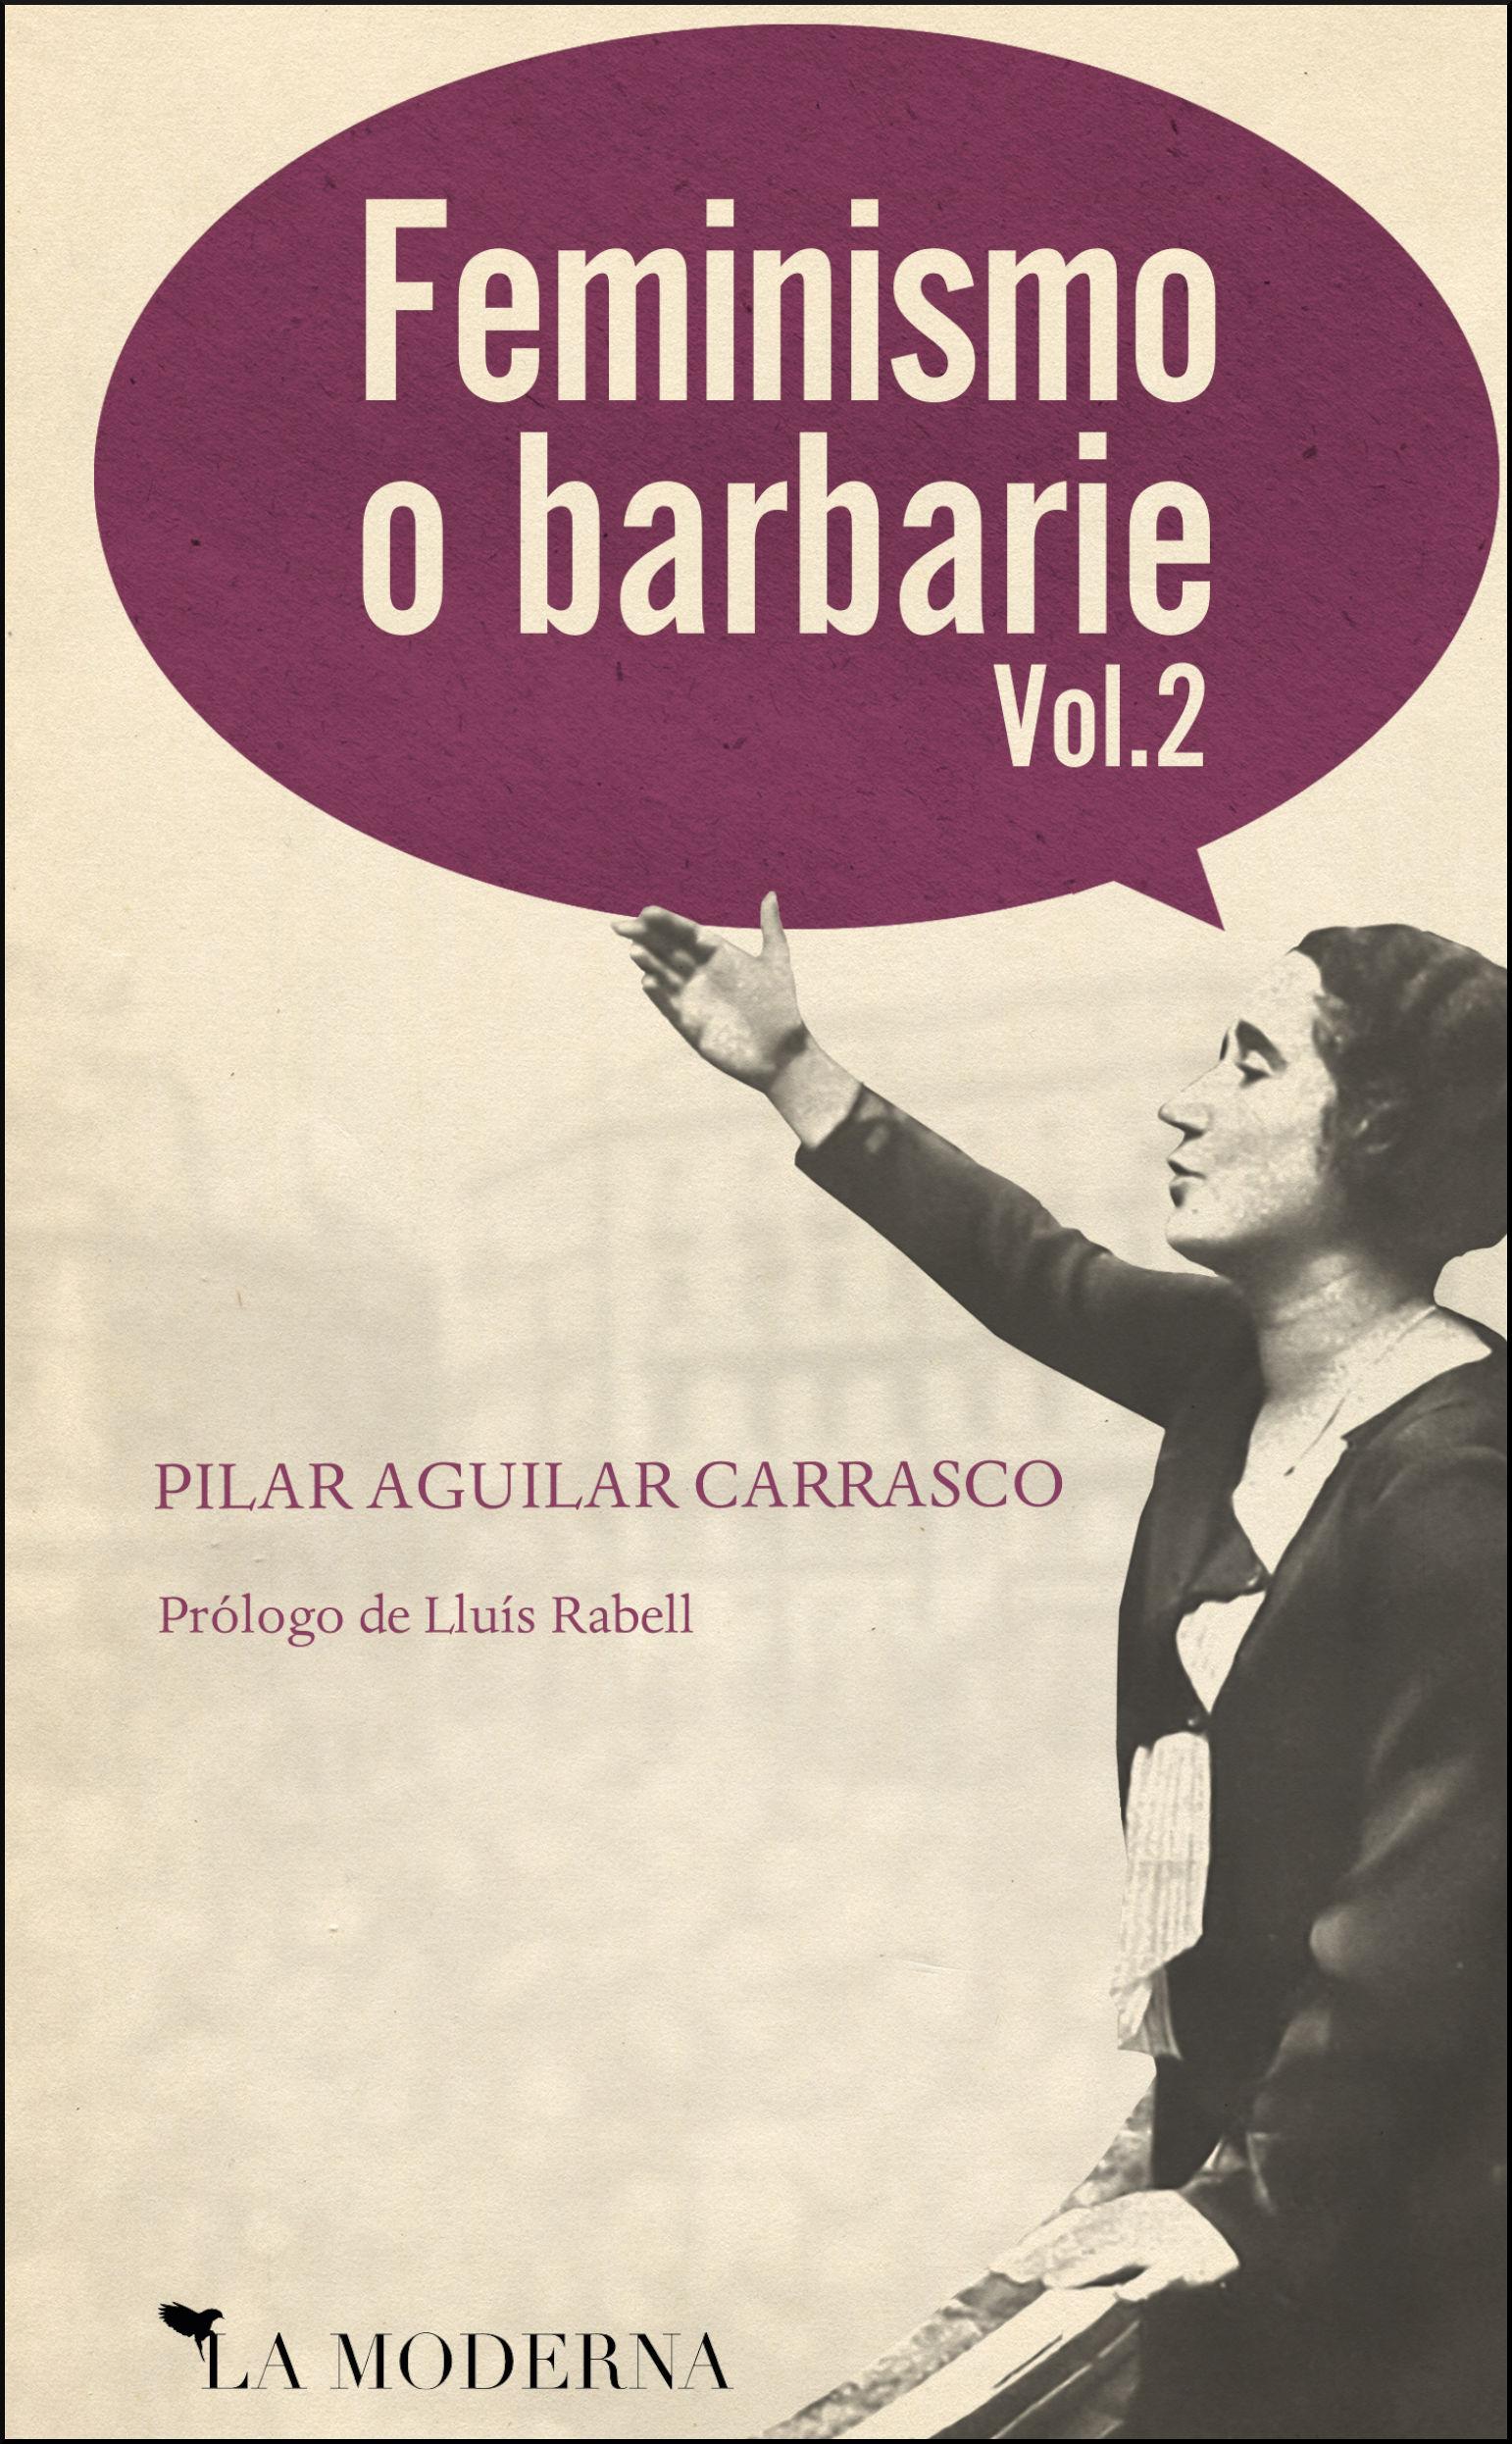 14x21 Feminismo o barbarie 2 - Portada - Pilar Aguilar